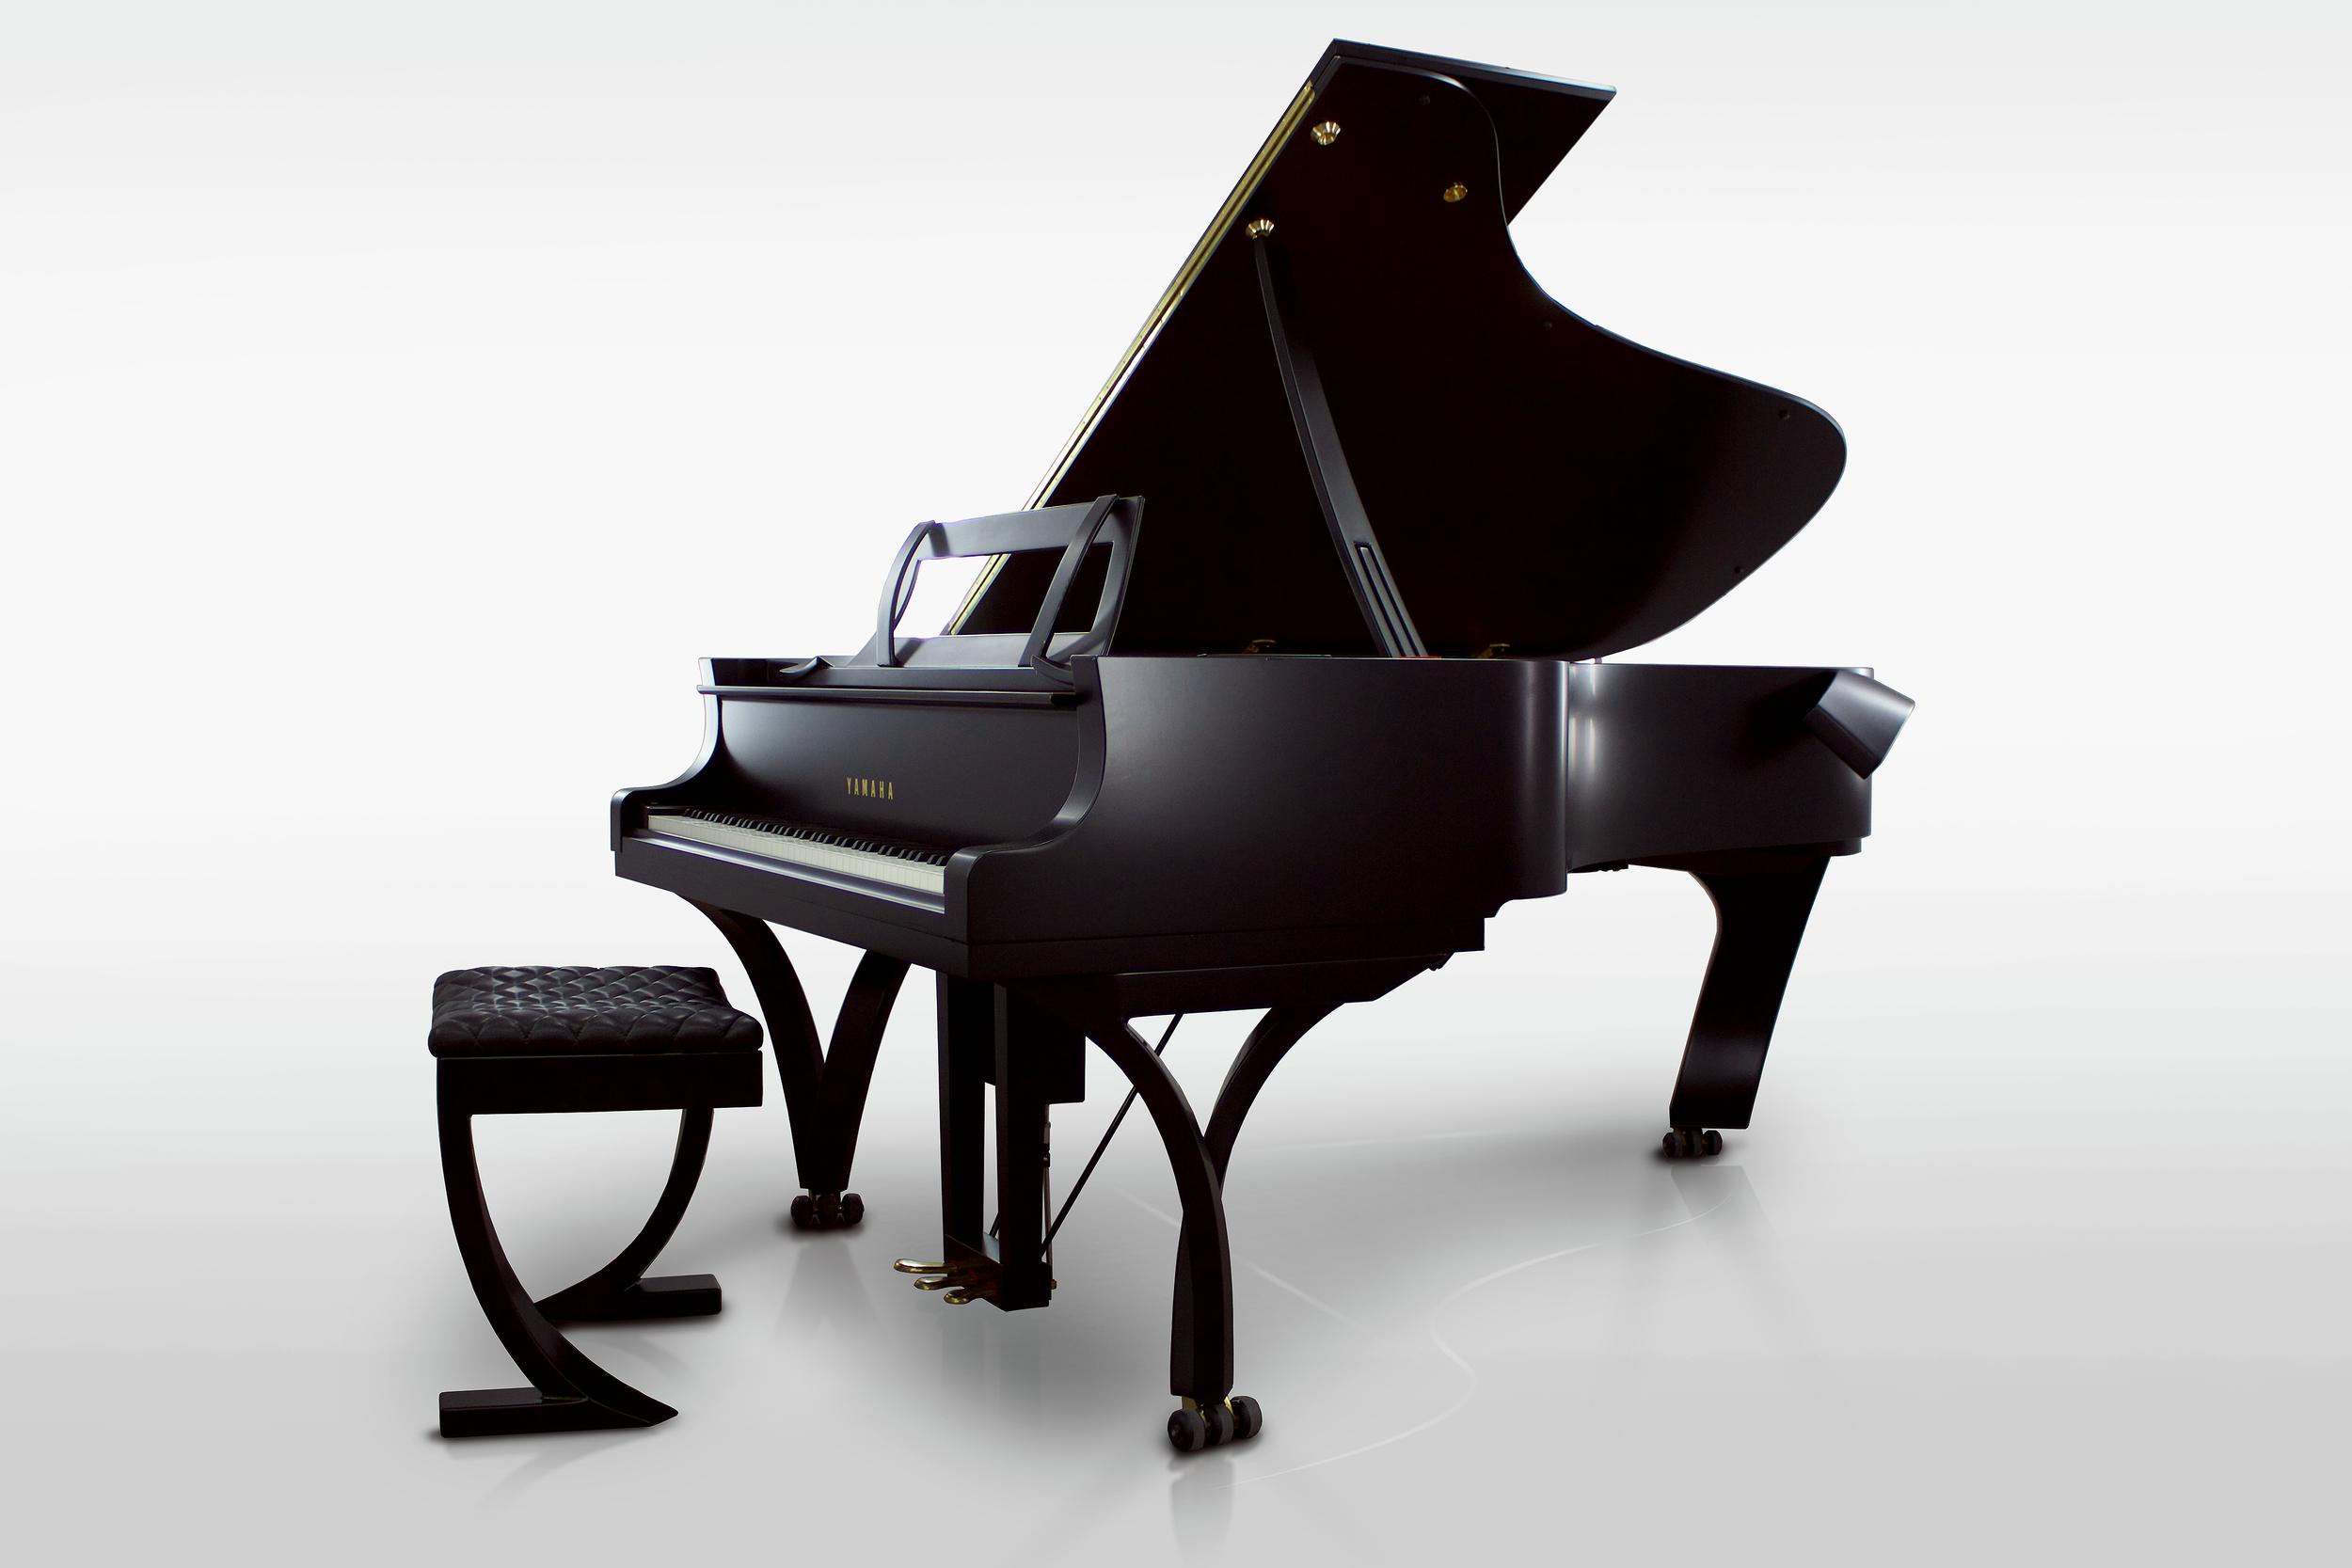 Avatar-disney-the-piano-guys-j-elliott-co.png